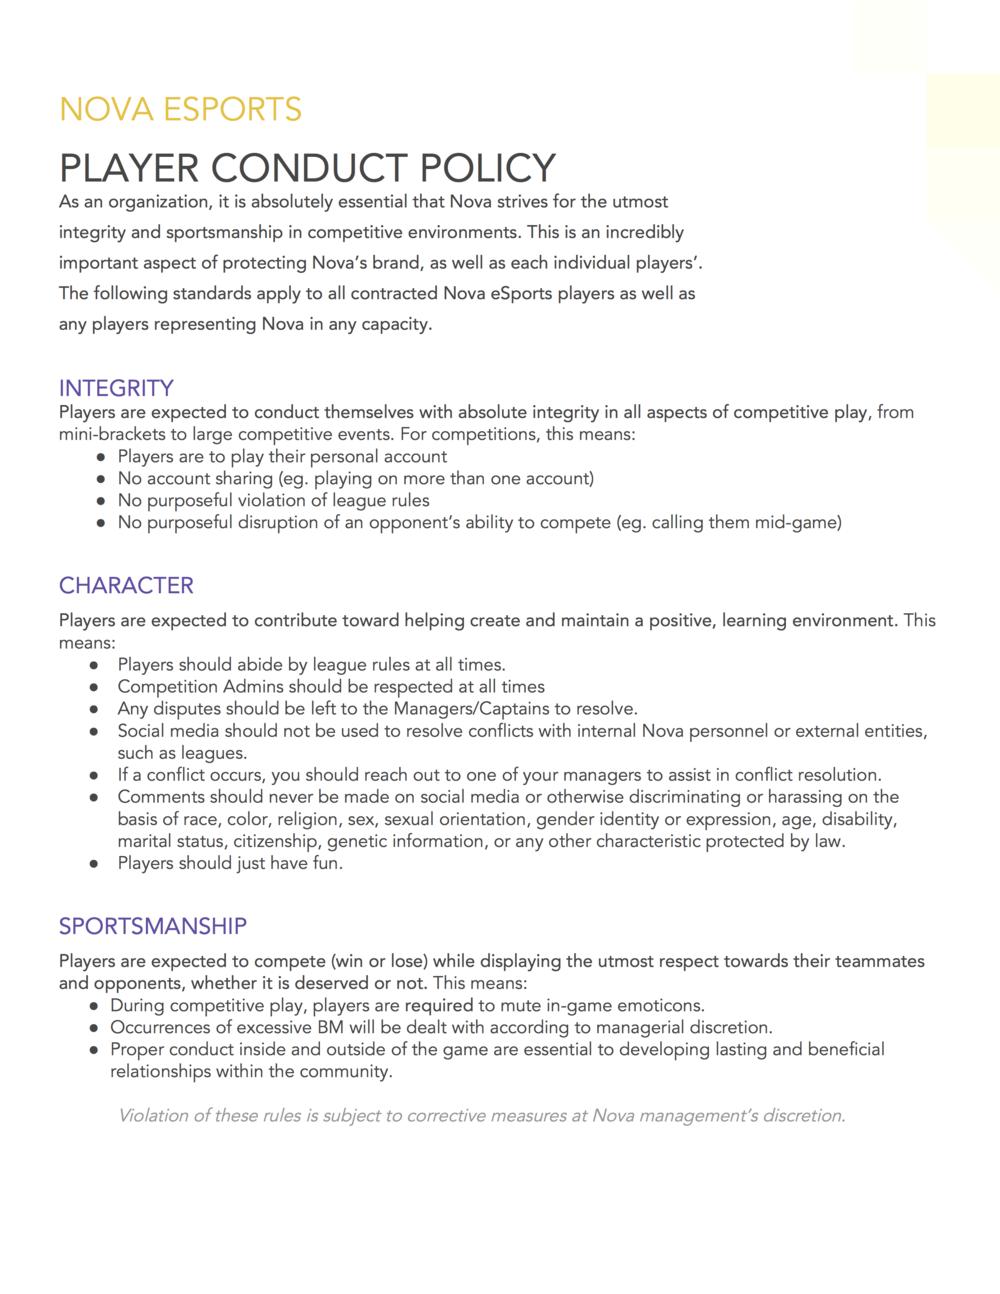 Nova Code of Conduct